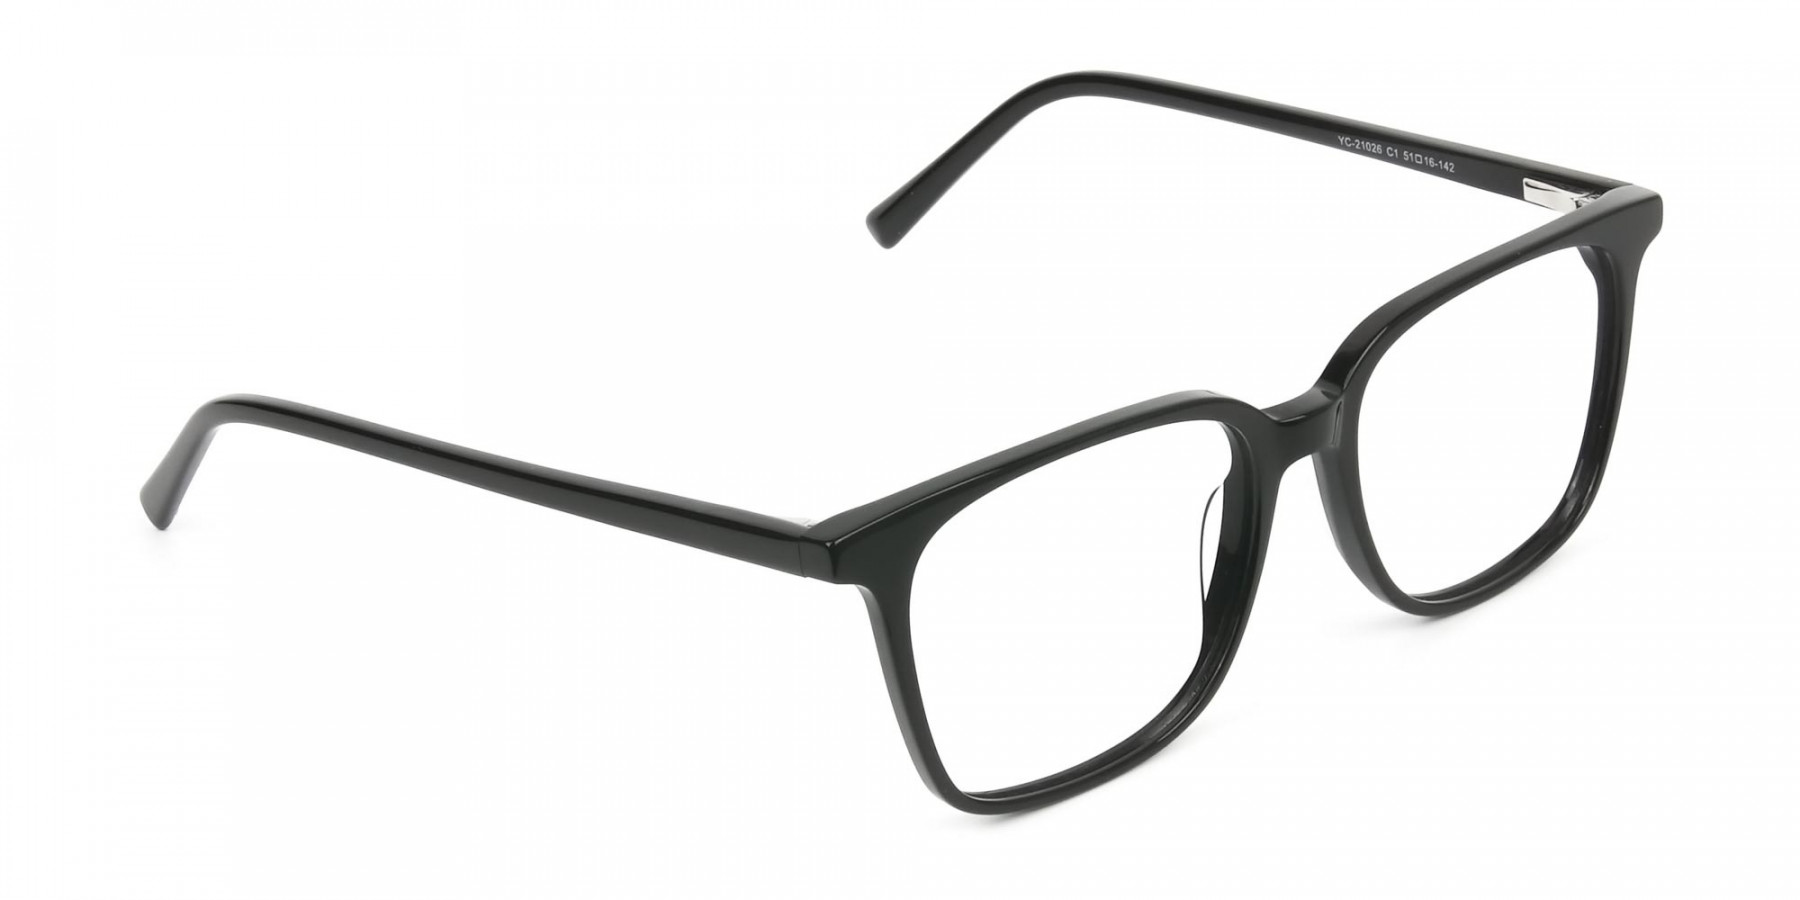 Wayfarer and Square Glasses in Black - 1